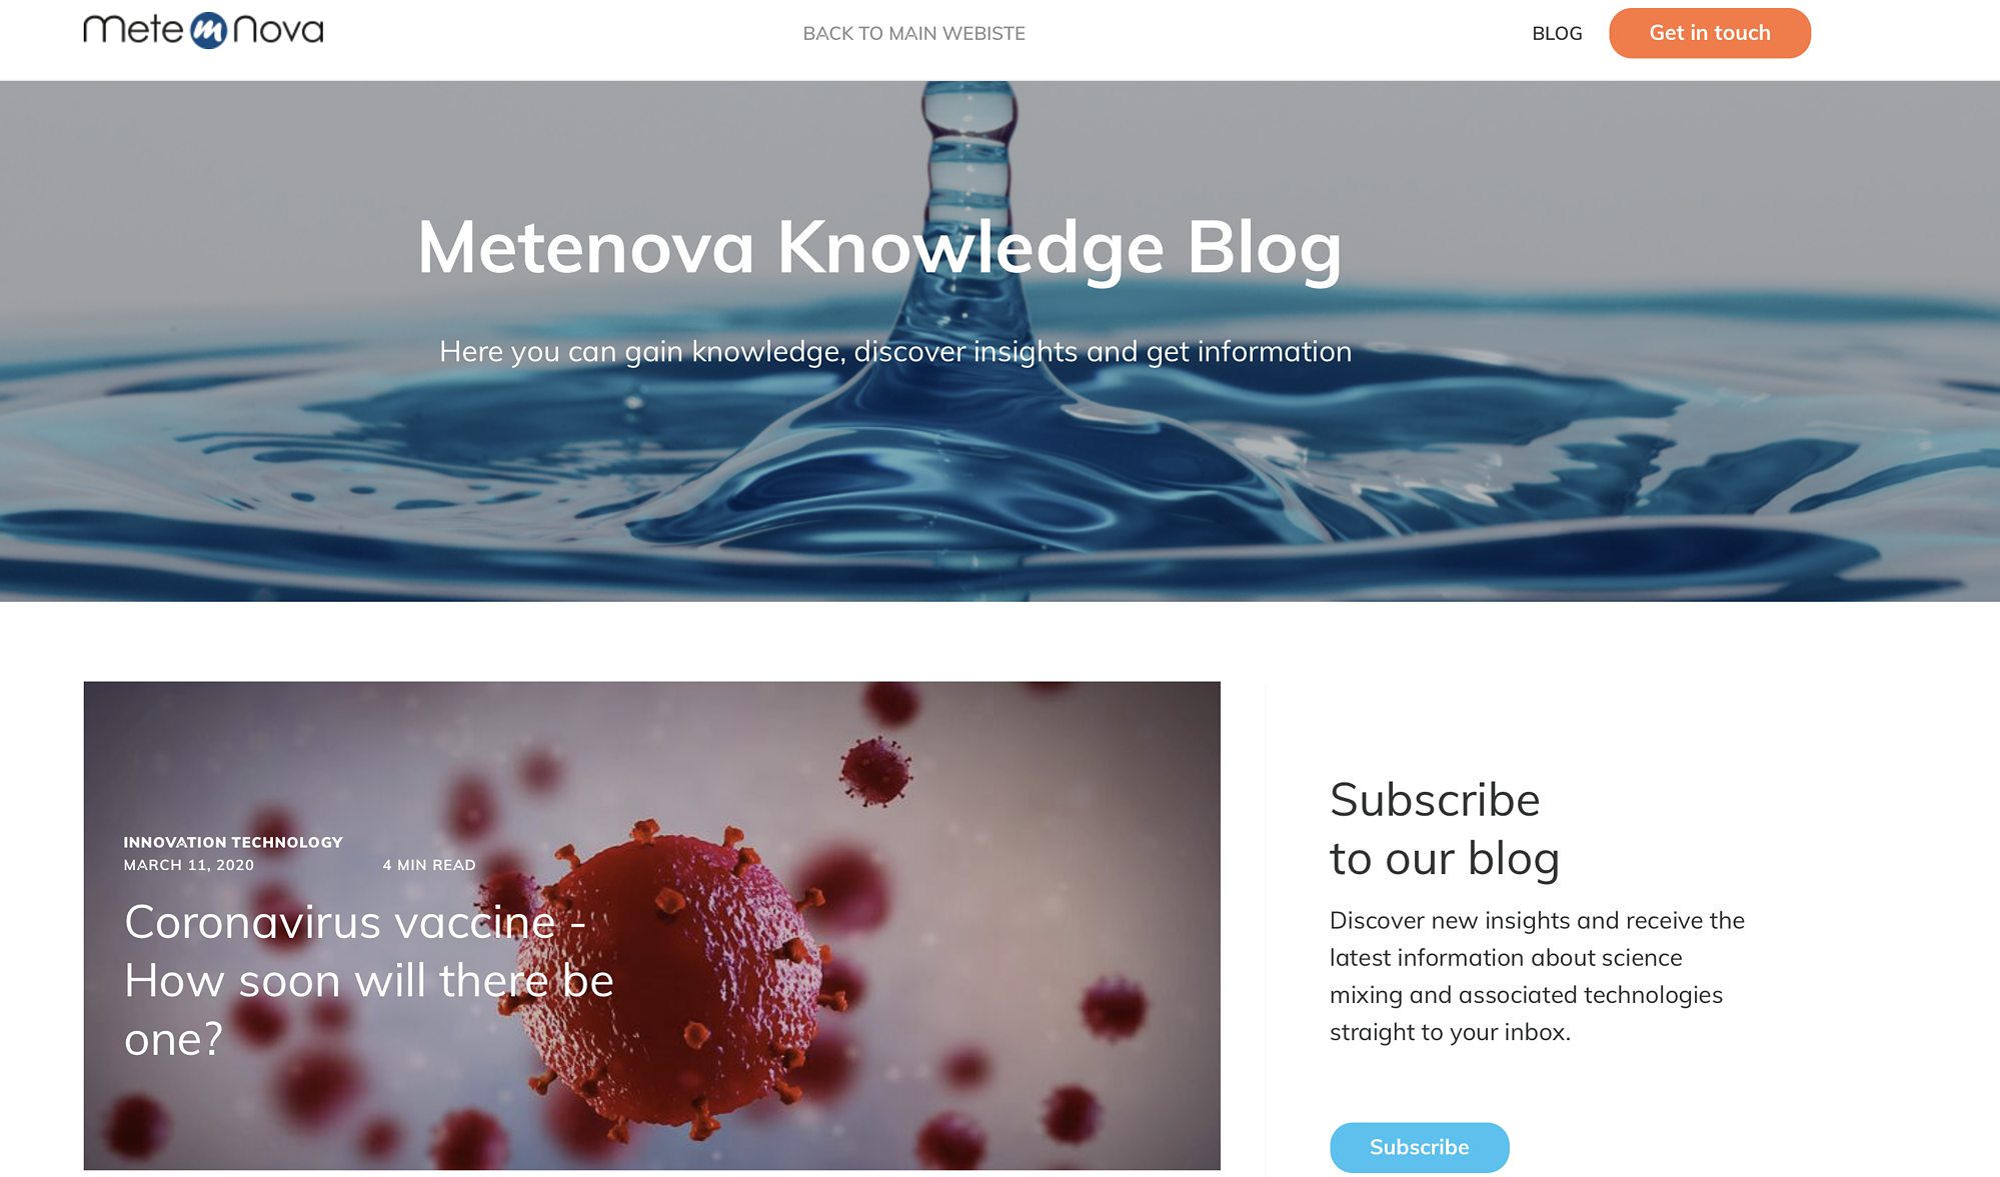 Congratulations, Metenova!